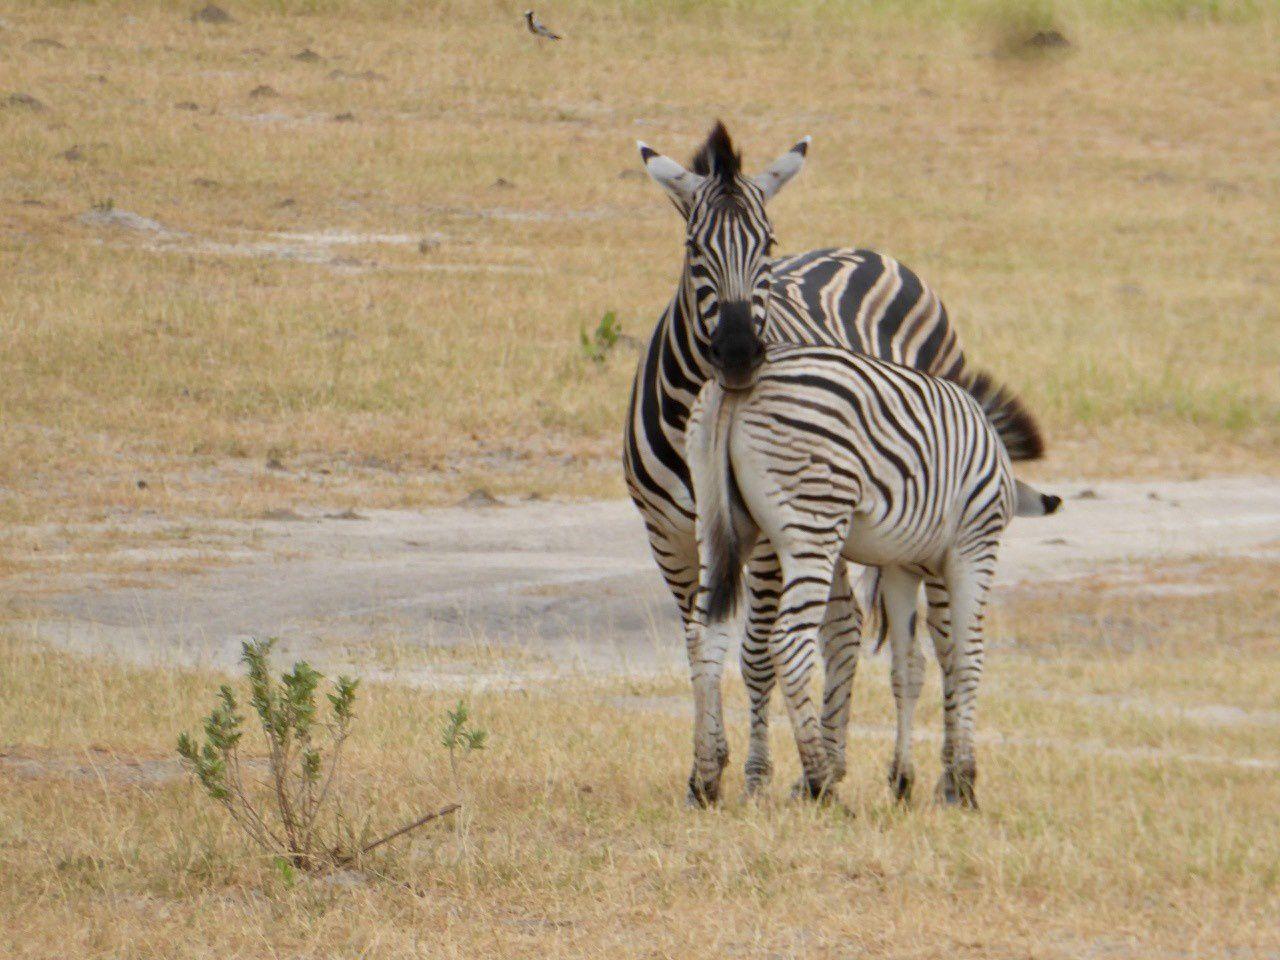 botswana, tout dernier regard ,merci africacoeurs